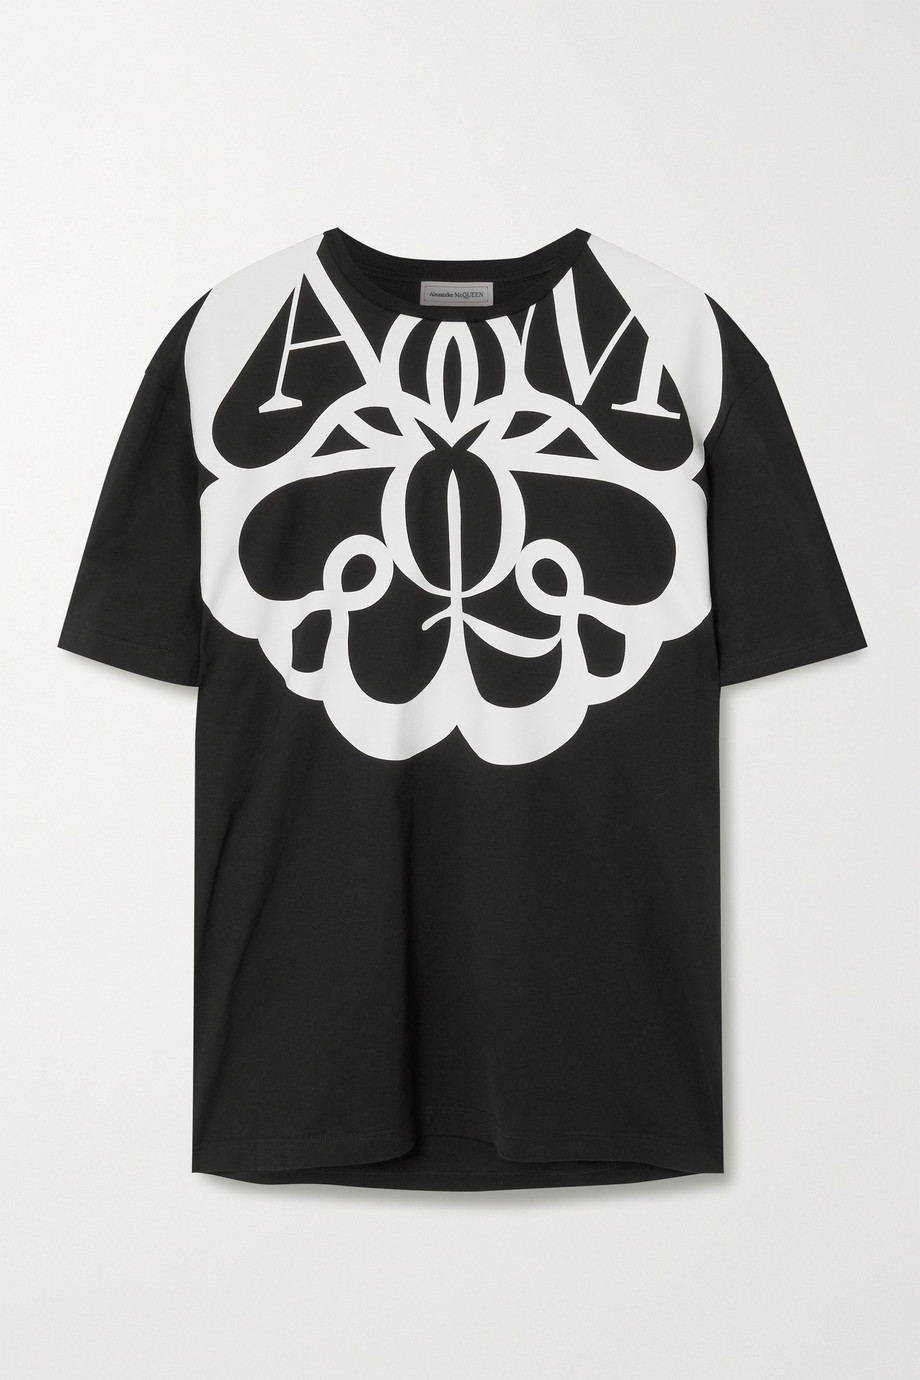 Alexander McQueen T-shirt en jersey de coton imprimé